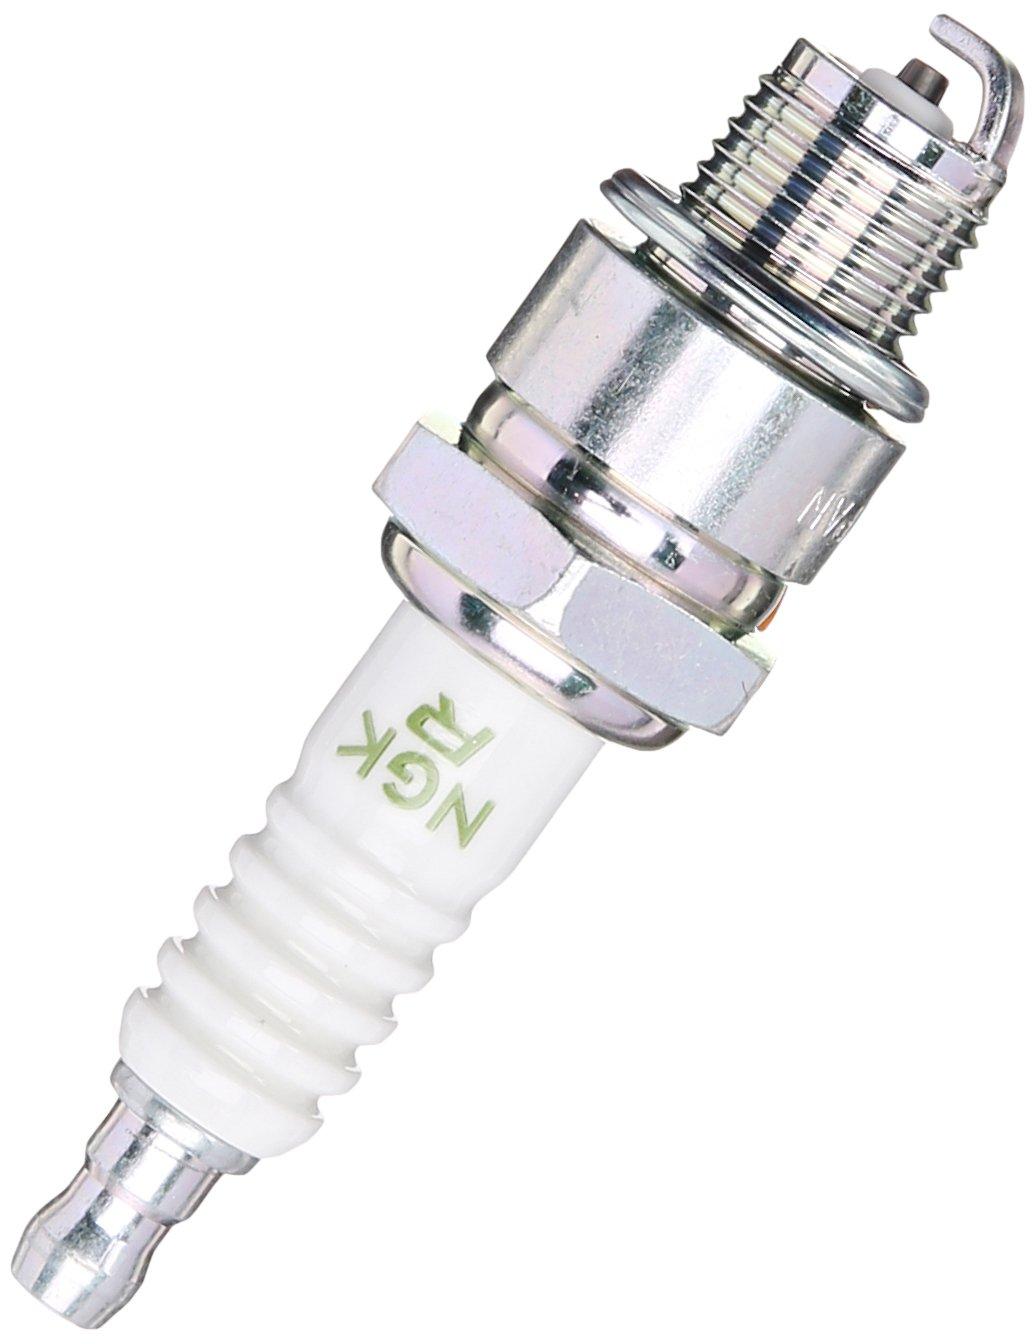 Amazon.com: NGK (4495) BPZ8H-N10 Standard Spark Plug, Pack of 1: Automotive